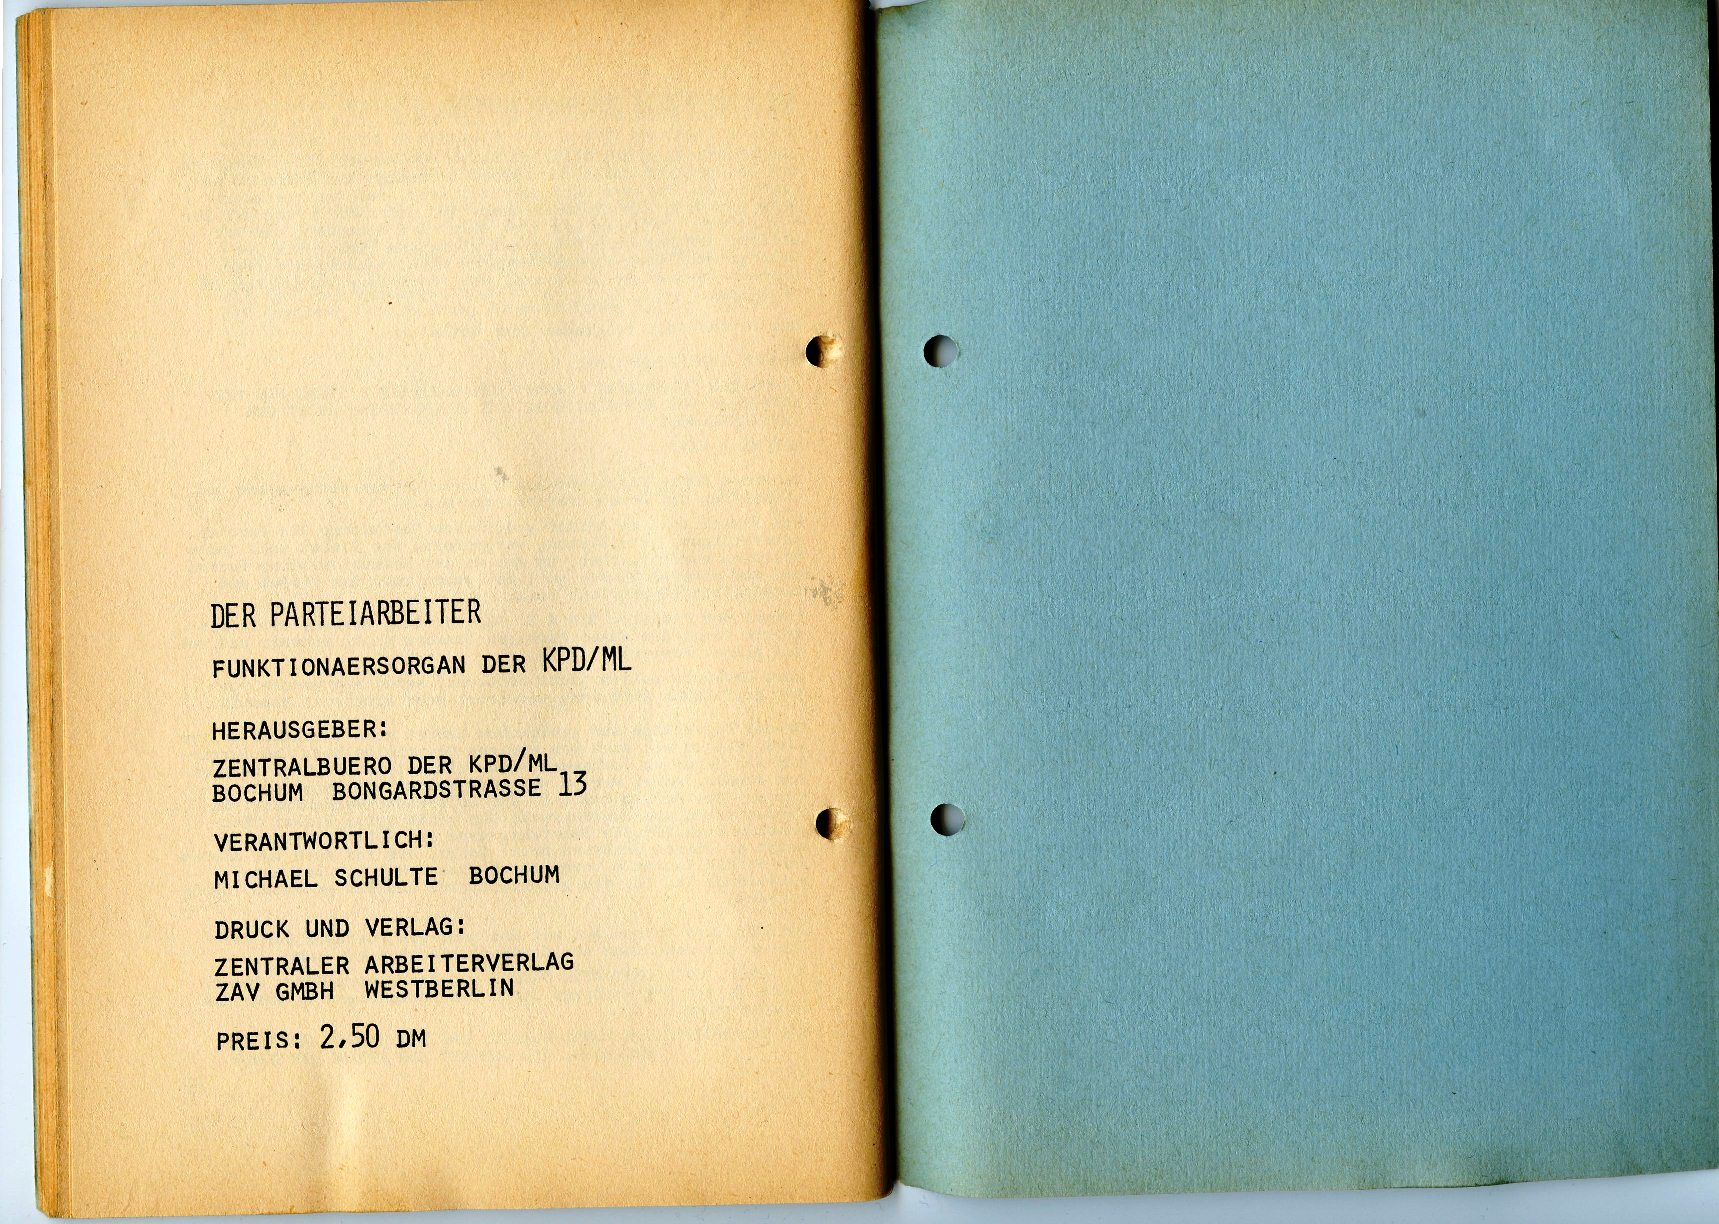 ZB_Parteiarbeiter_1971_04_29